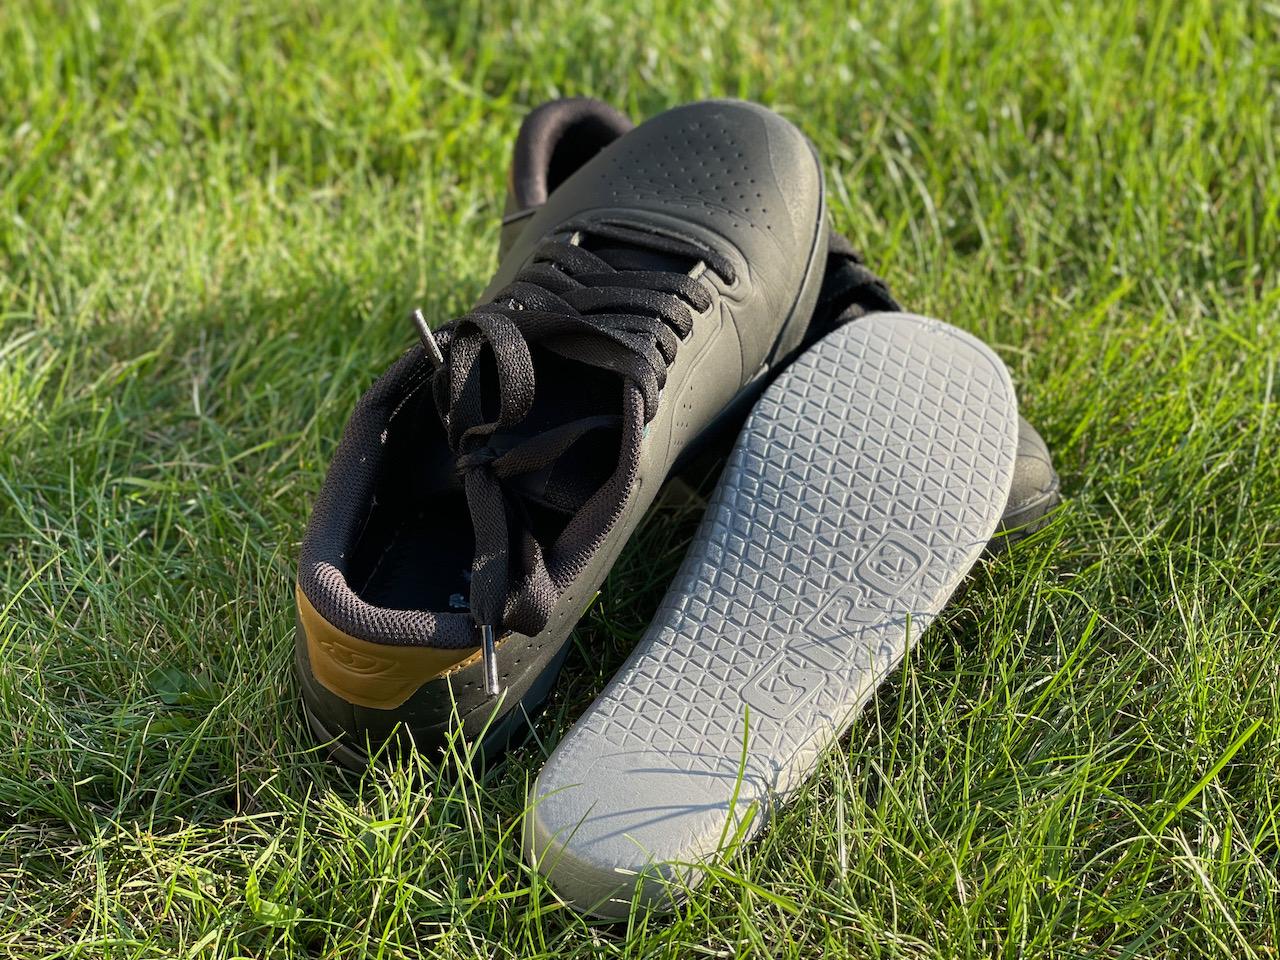 Giro Latch MTB shoes insole